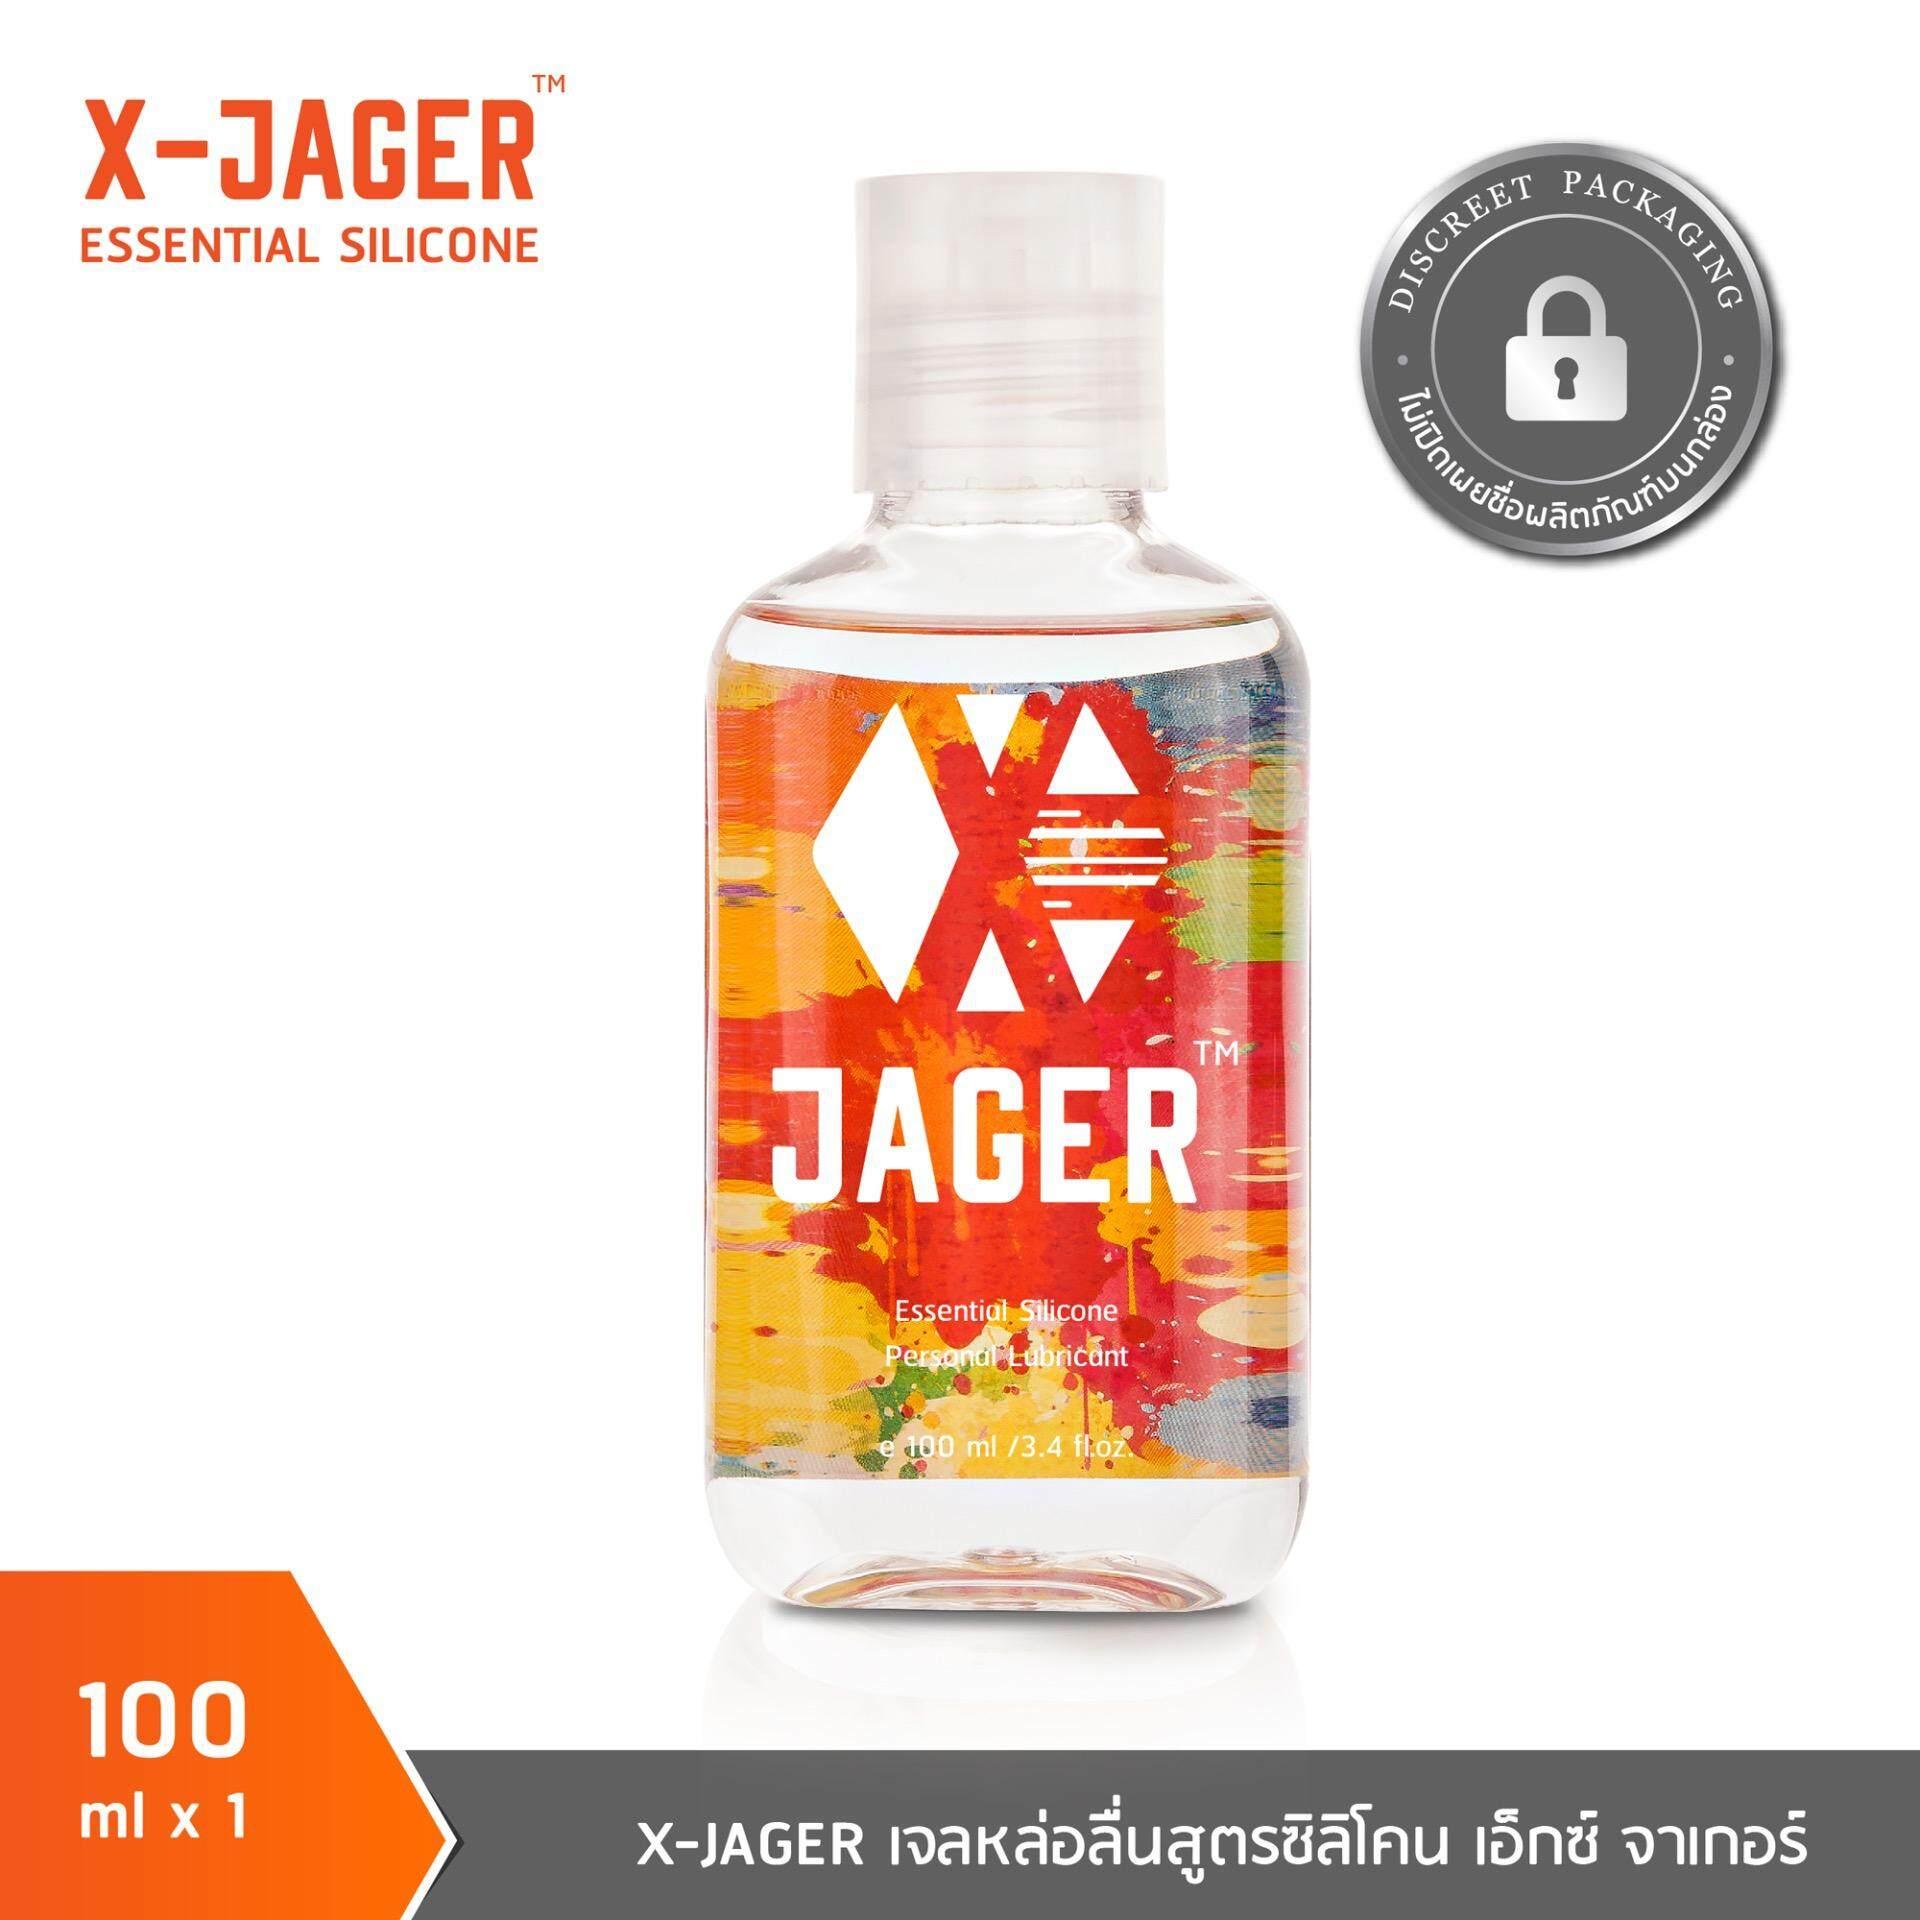 Hej X Jager เจลหล่อลื่น สูตรซิลิโคน ขนาด 100 มล. นวัตกรรมใหม่ ลื่นระดับสูงสุด ลื่นยาวนาน ไม่แห้ง ไม่เหนียว By Hejshop.